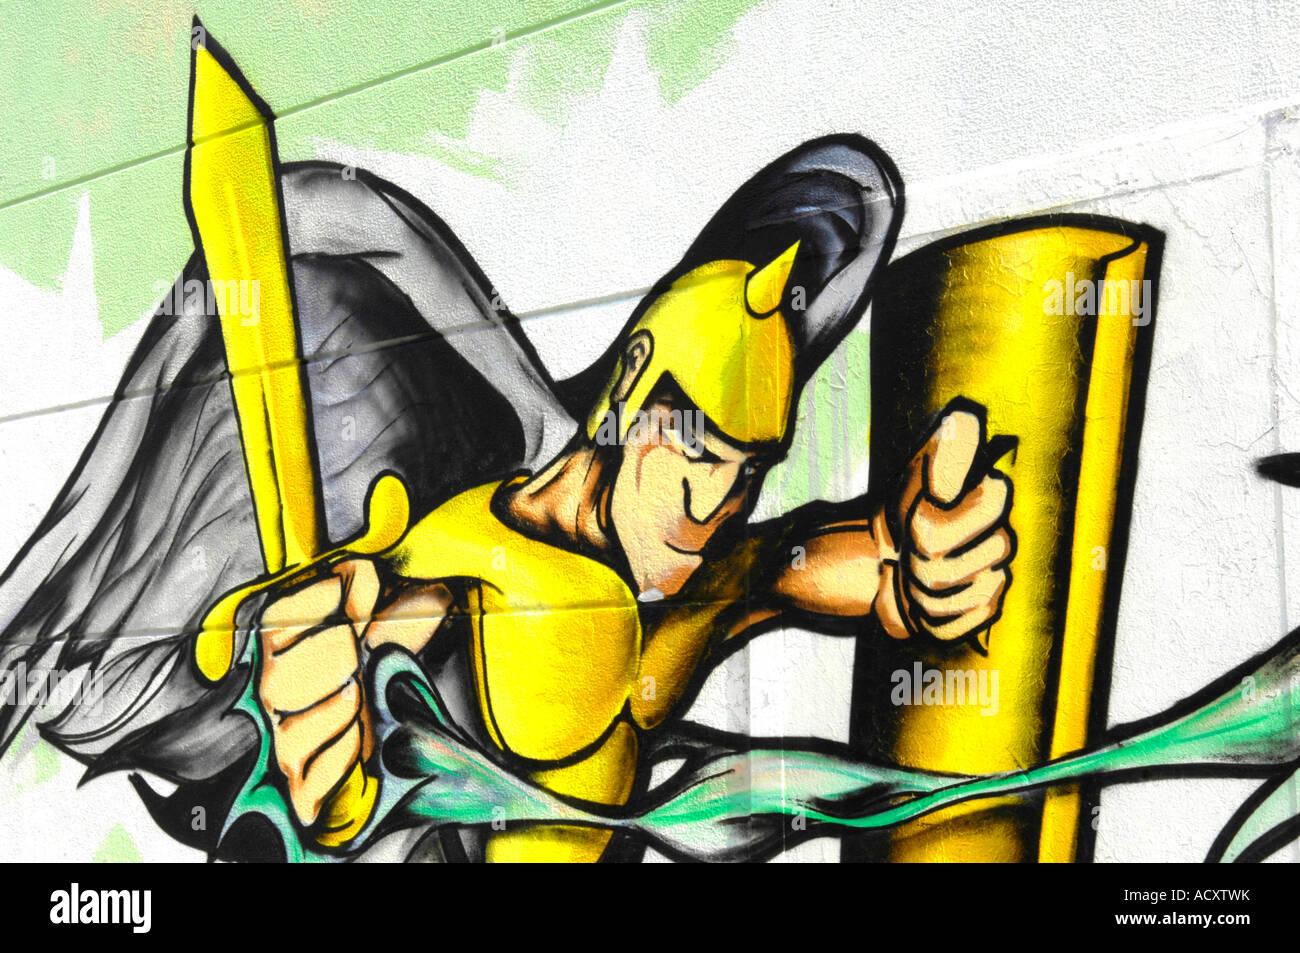 graffiti art graf spraypaint aerosol crime criminal damage mural ...